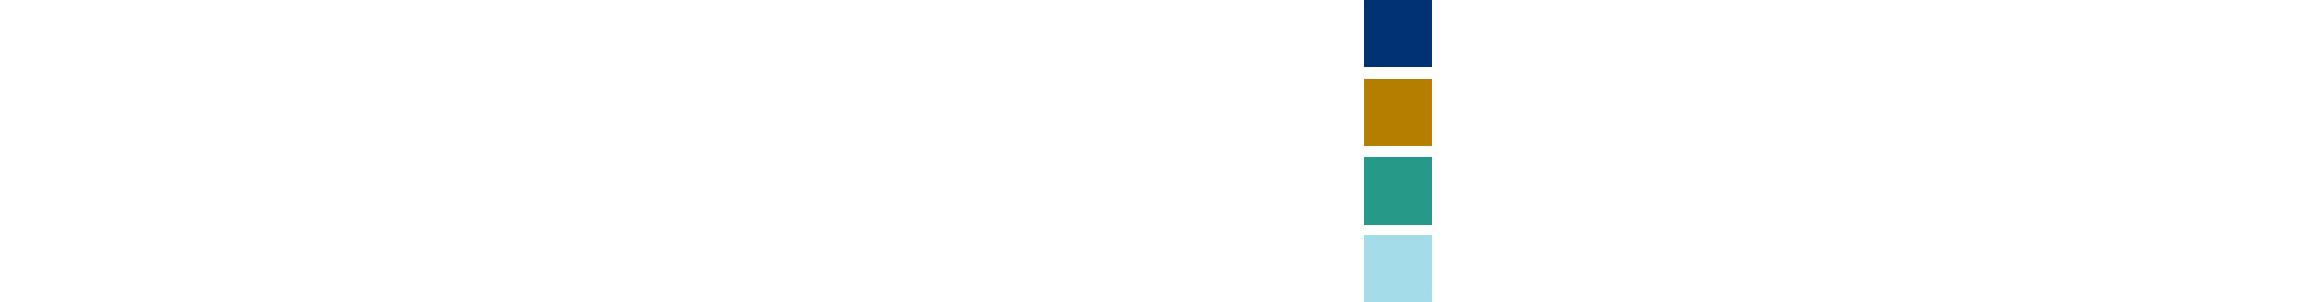 calero-mdsl-vector-white